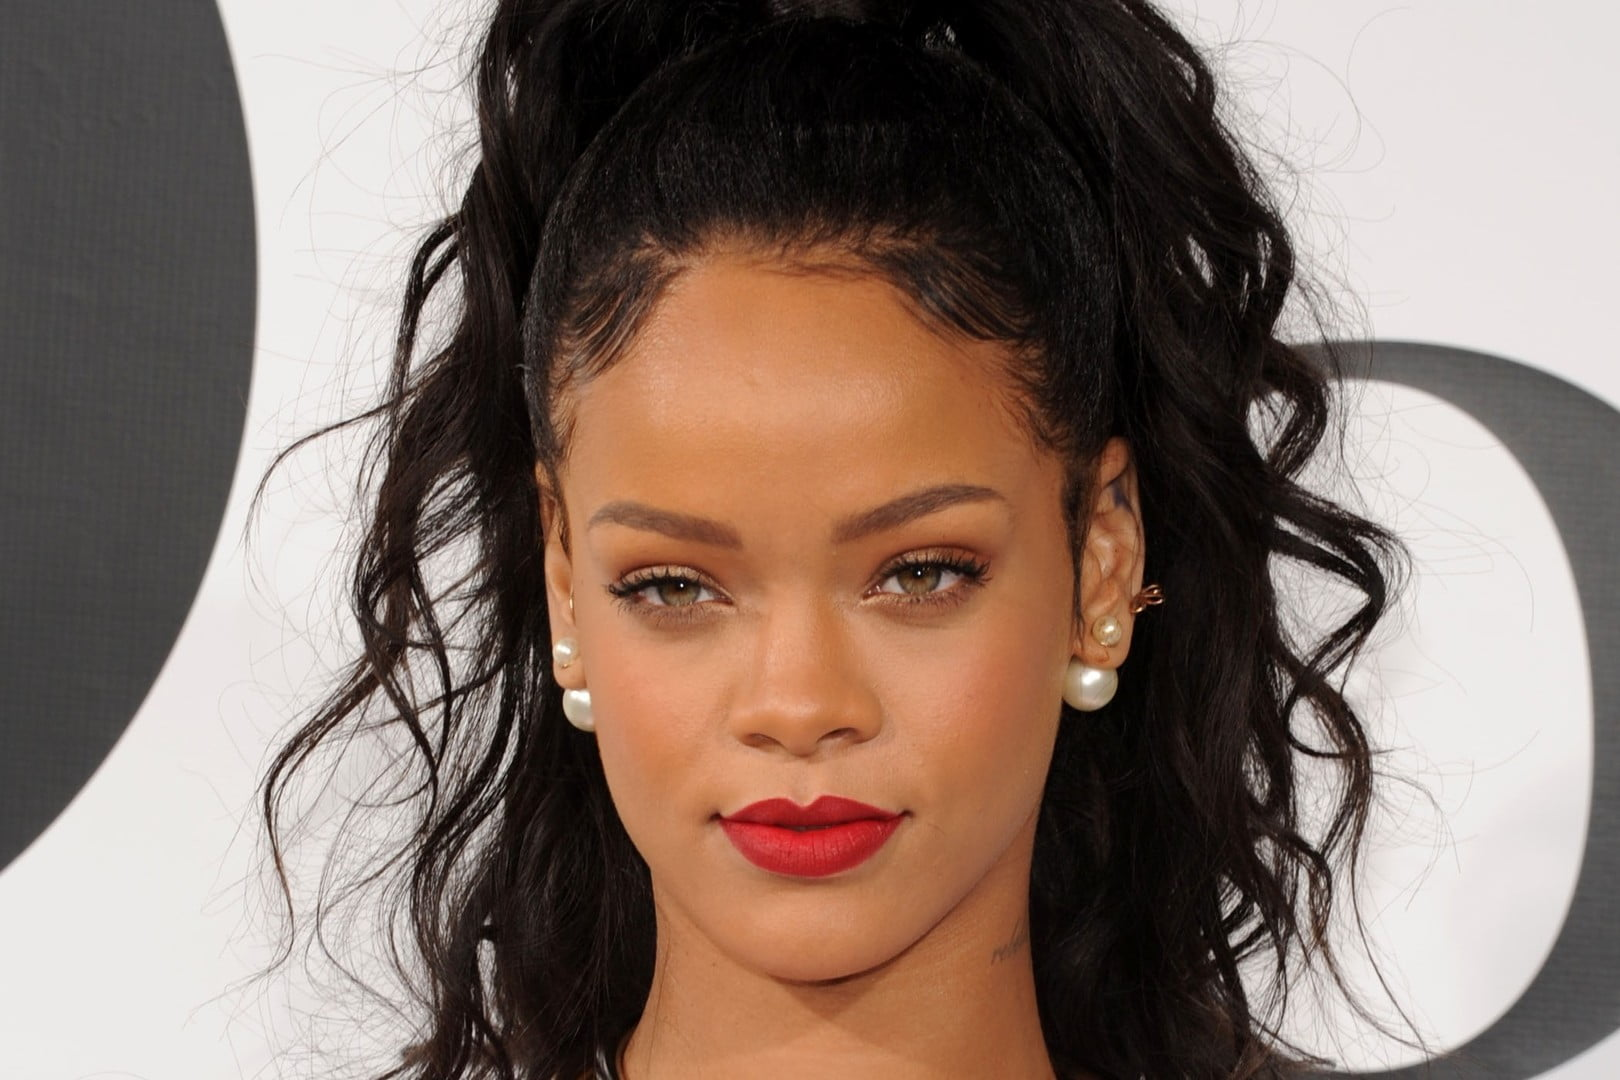 Rihanna Hairstyles 2016-2017 Curly Long Black Hair